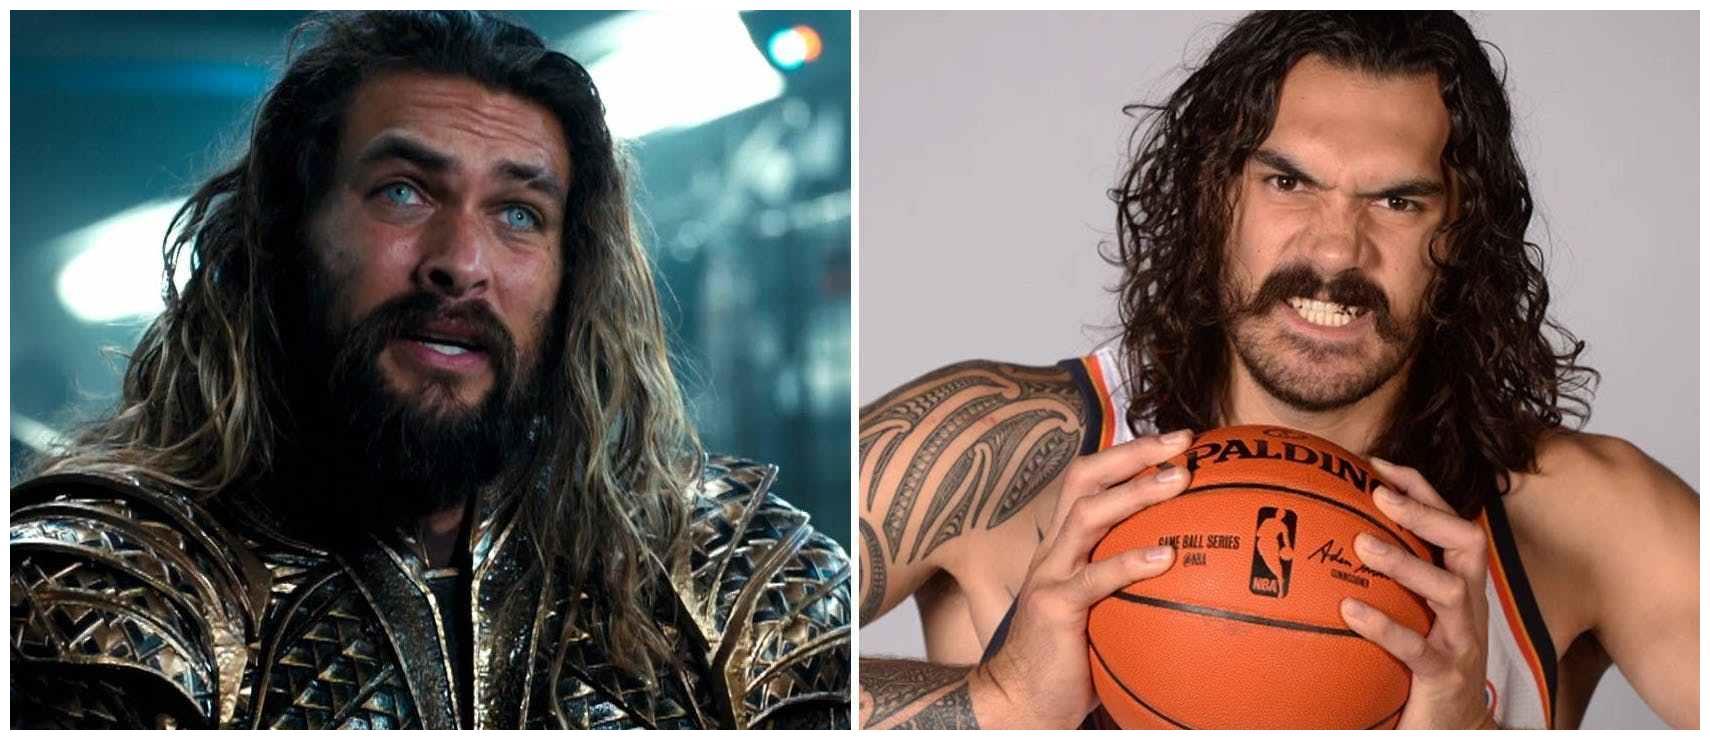 NBA的海王也有超人的基因,看看篮球明星亚当斯的逆天家庭